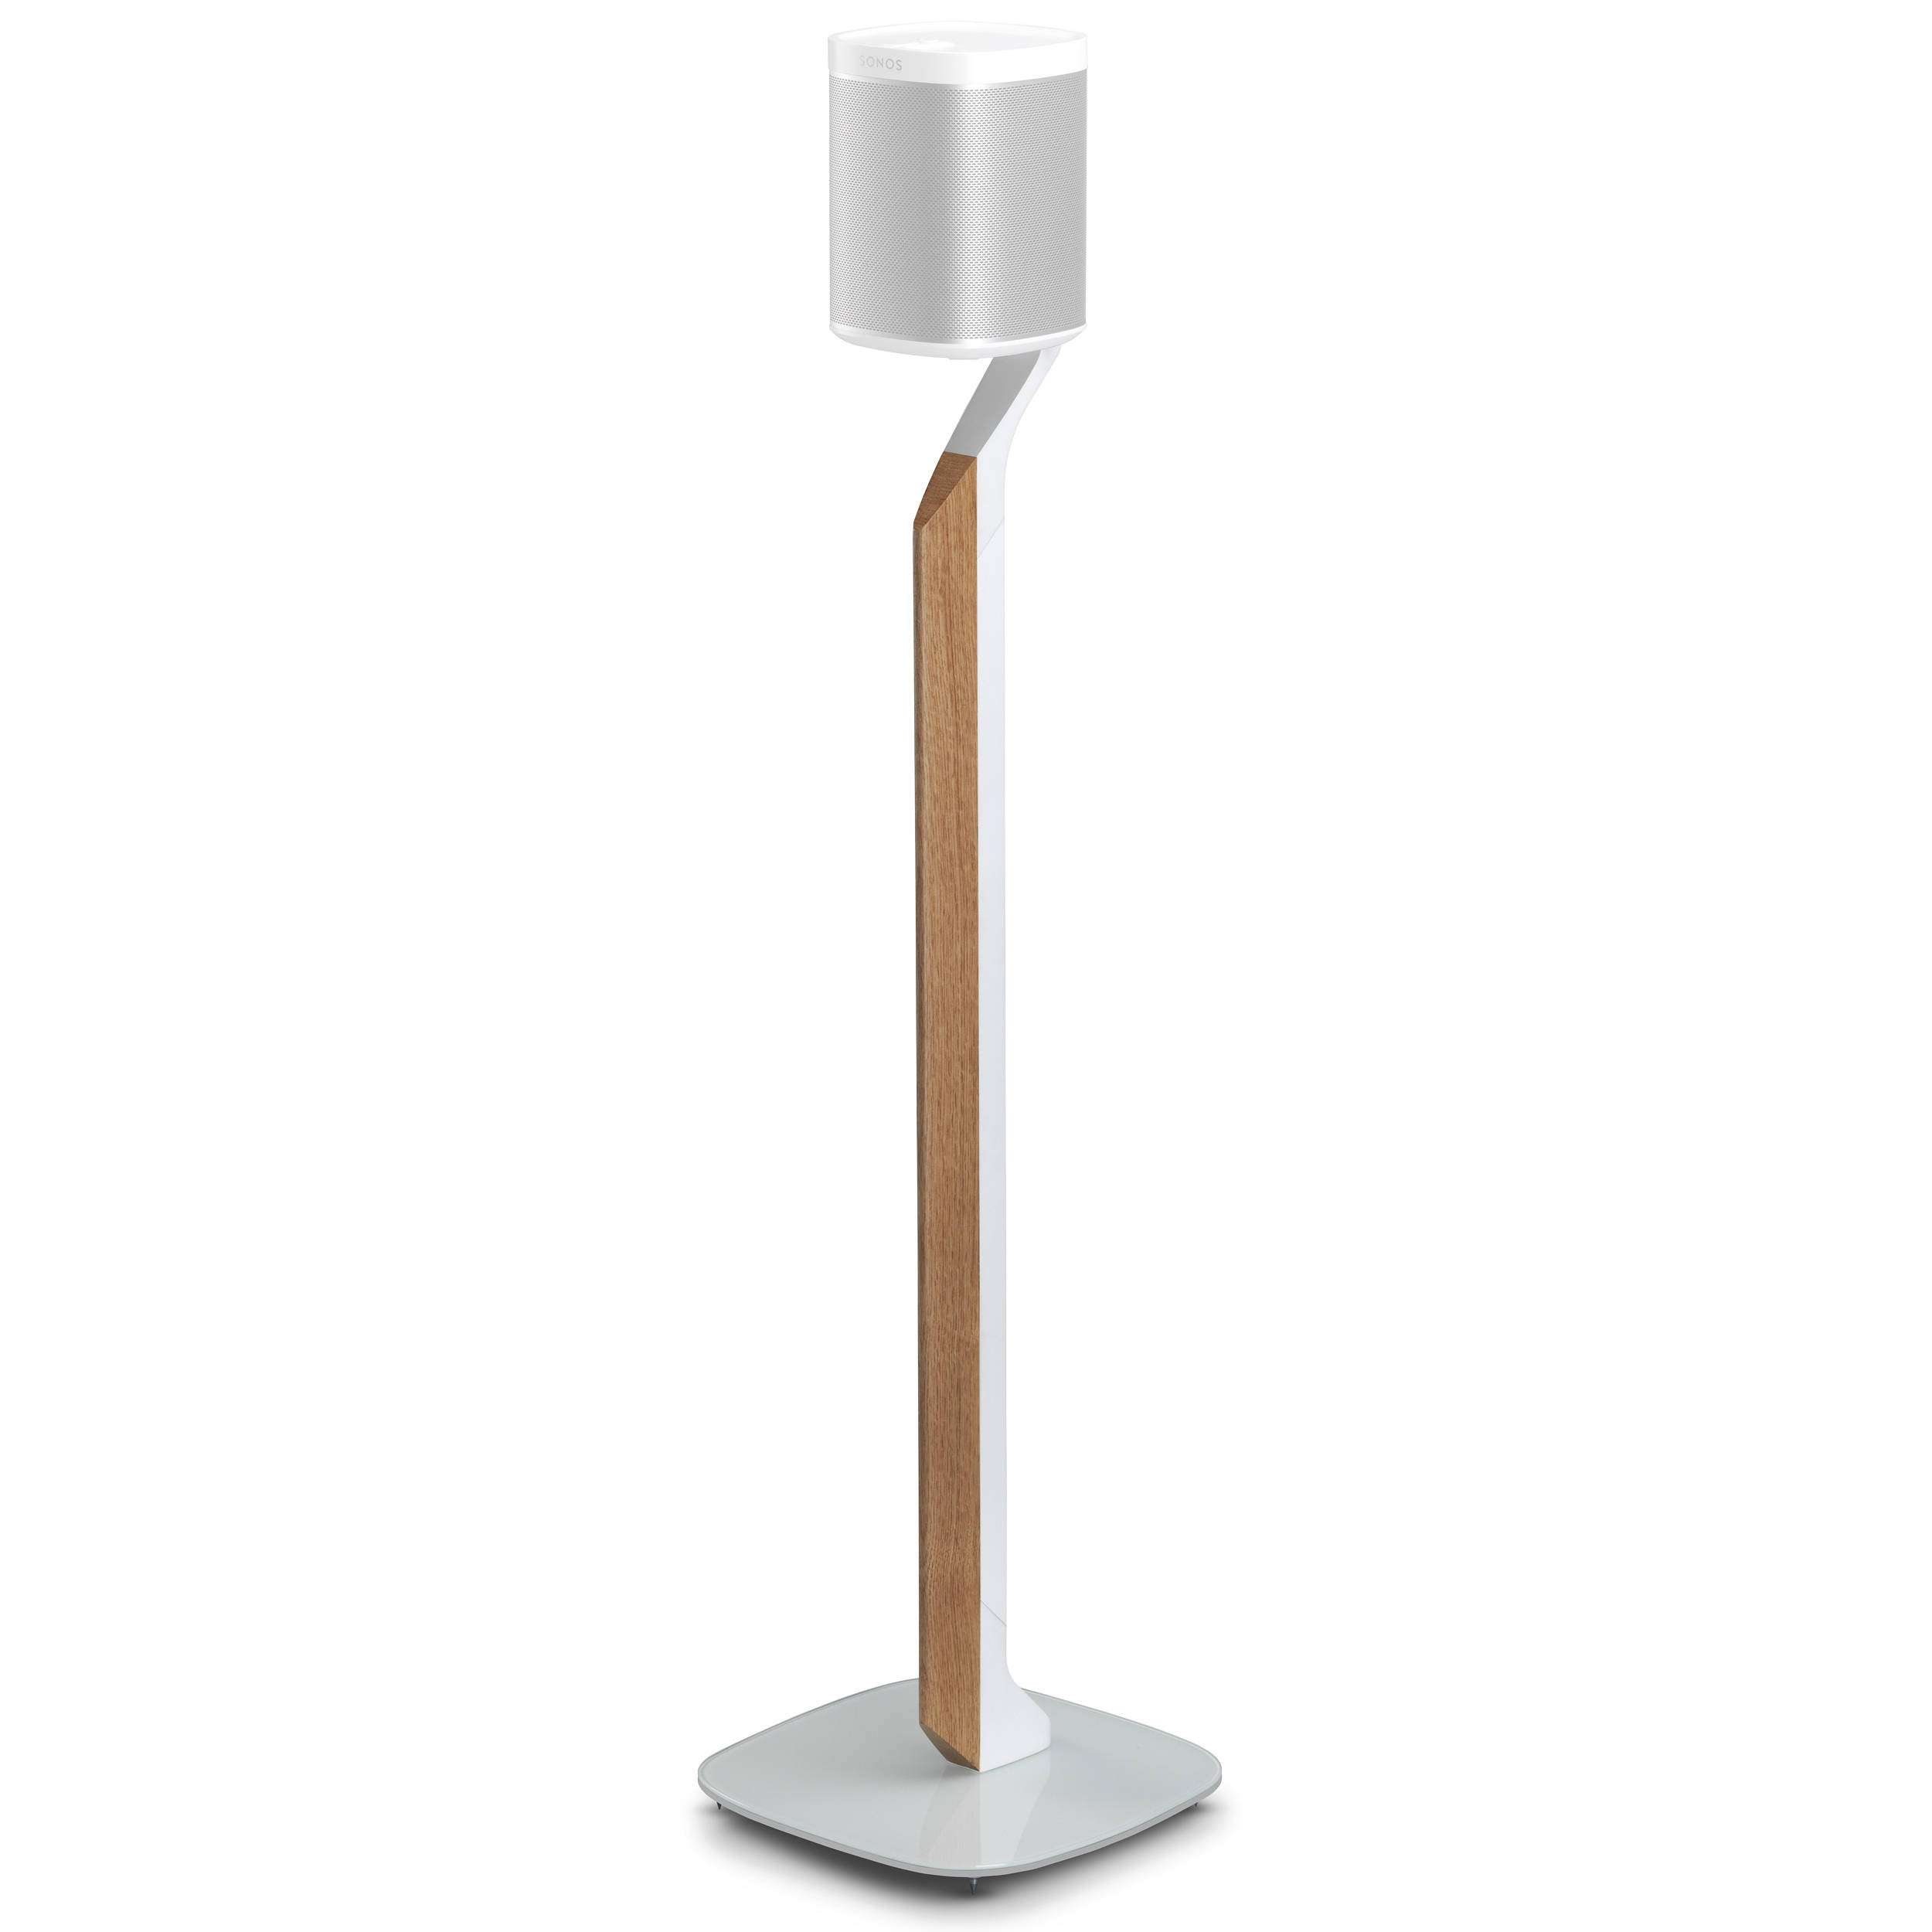 flexson premium floor stand for sonos play 1 flxp1pfs1011 b h. Black Bedroom Furniture Sets. Home Design Ideas